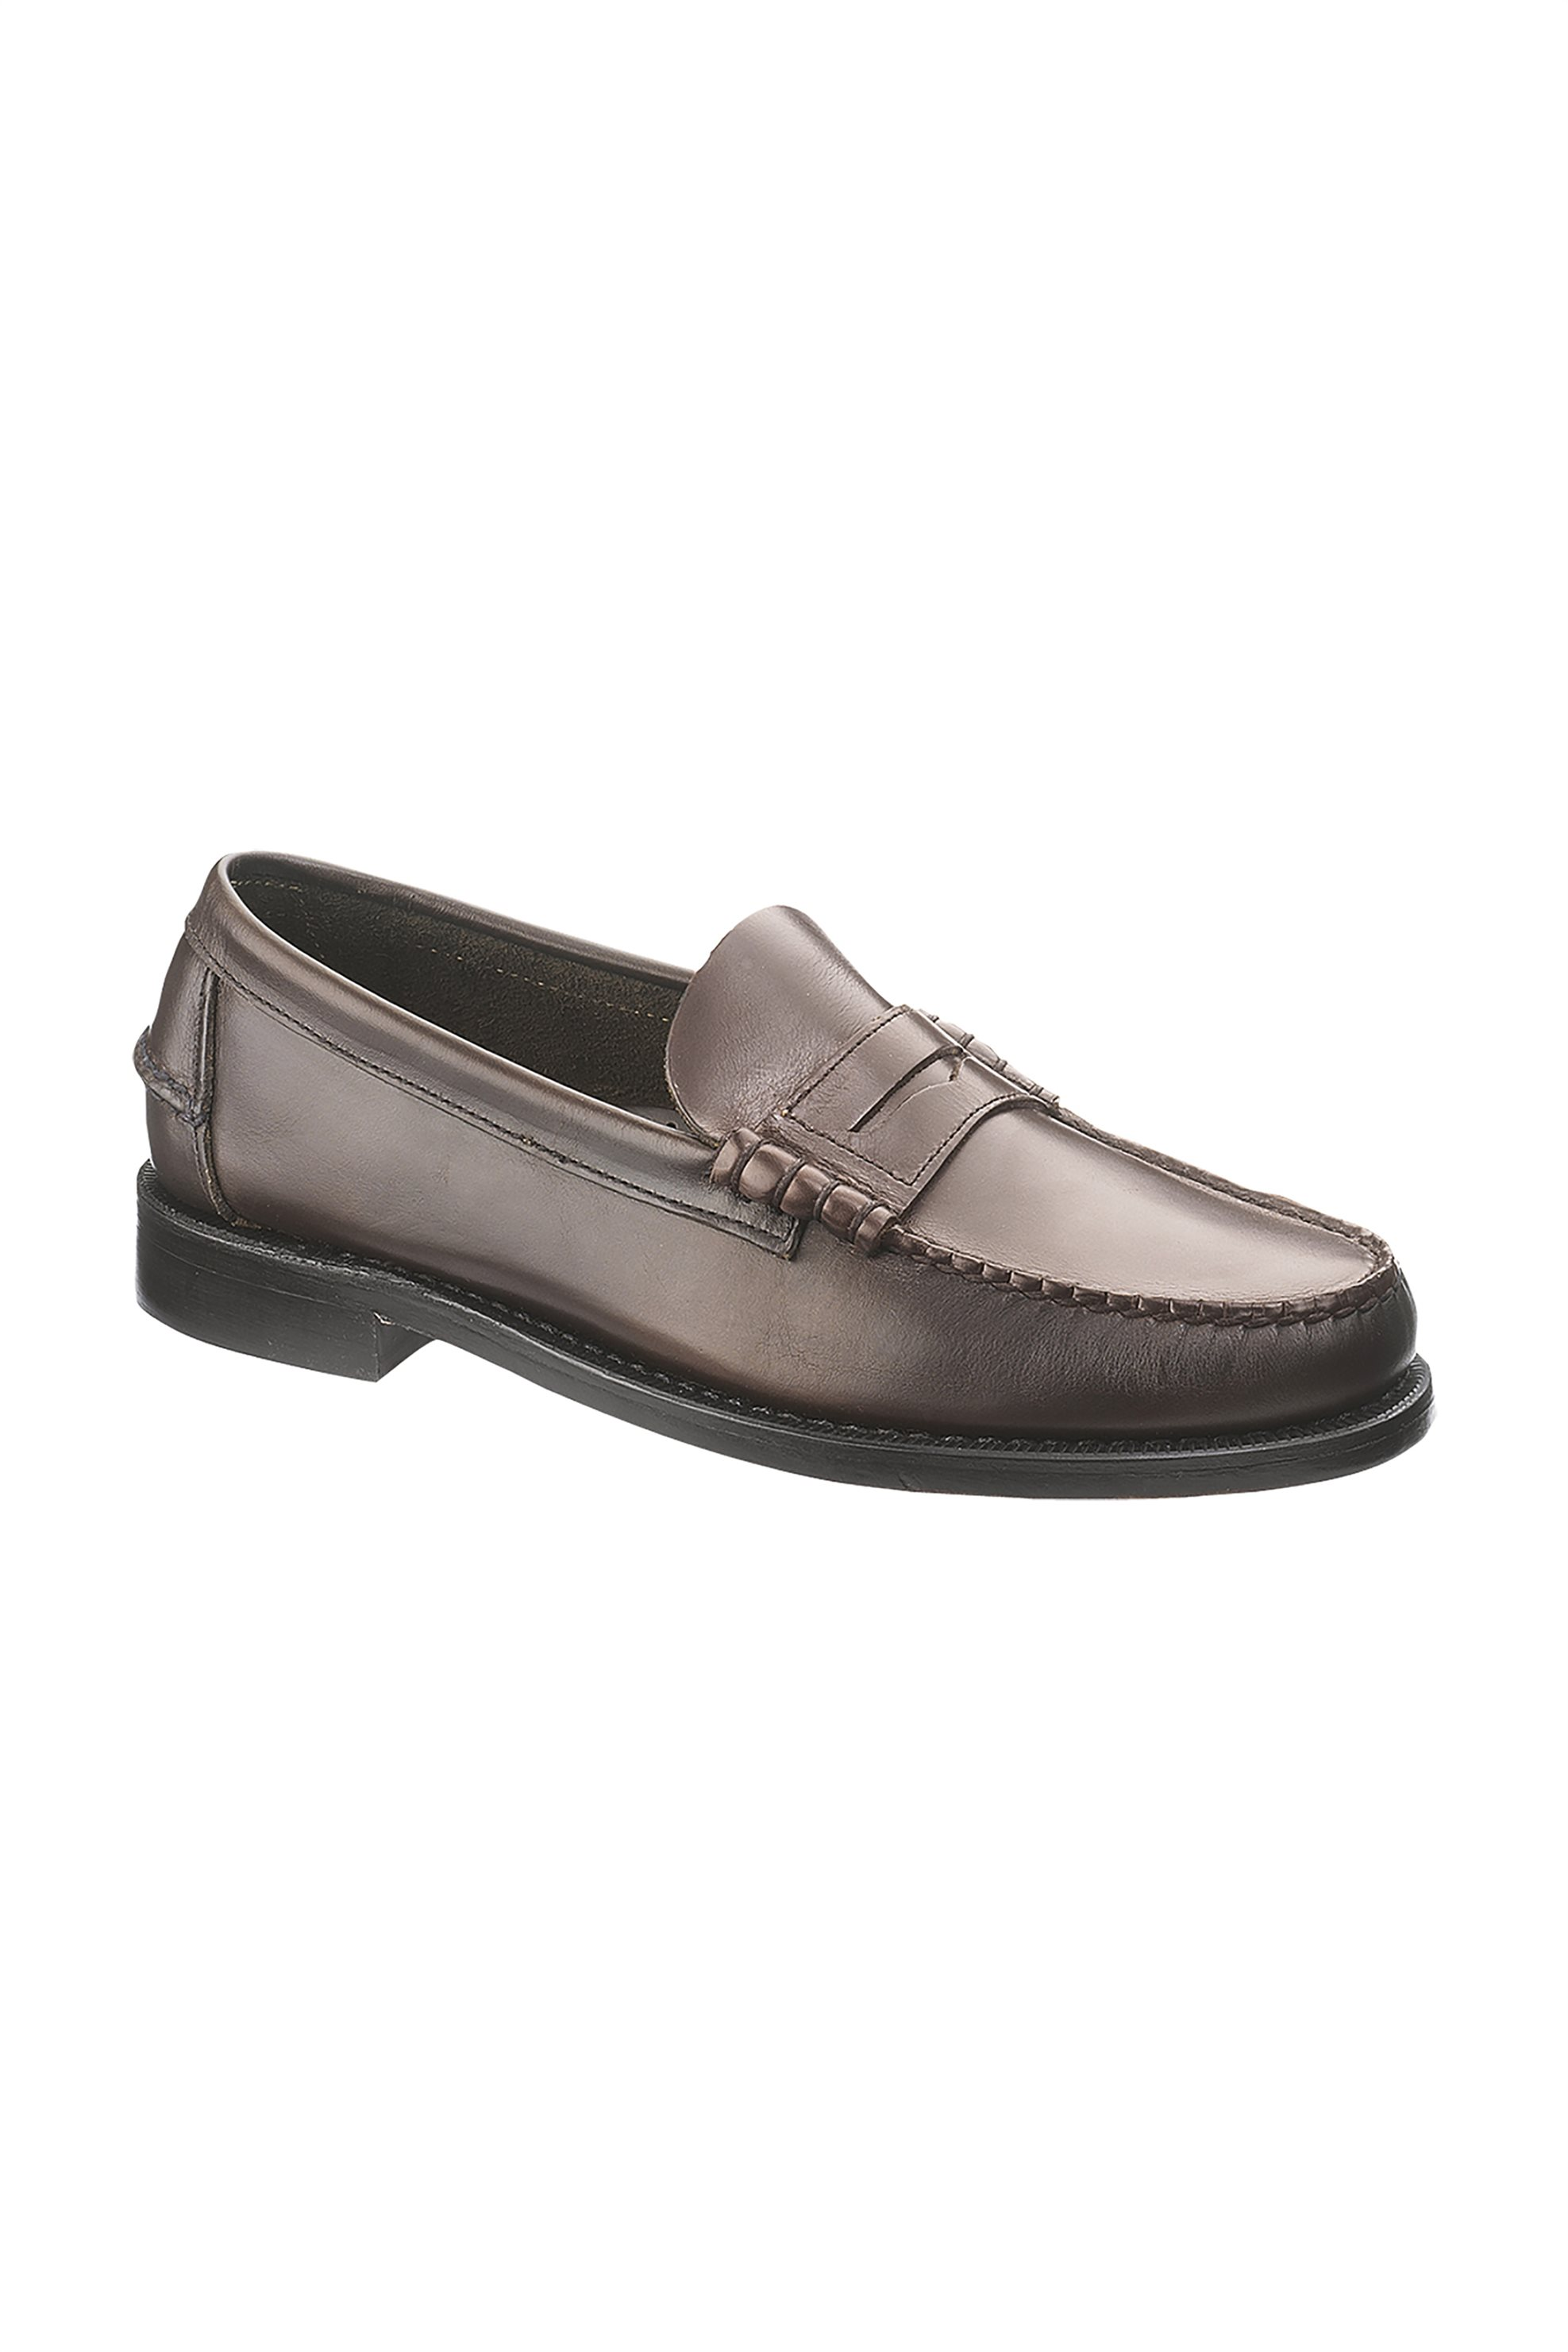 54462e4c13d Notos Sebago ανδρικά παπούτσια loafers classic - B76619EE - Καφέ